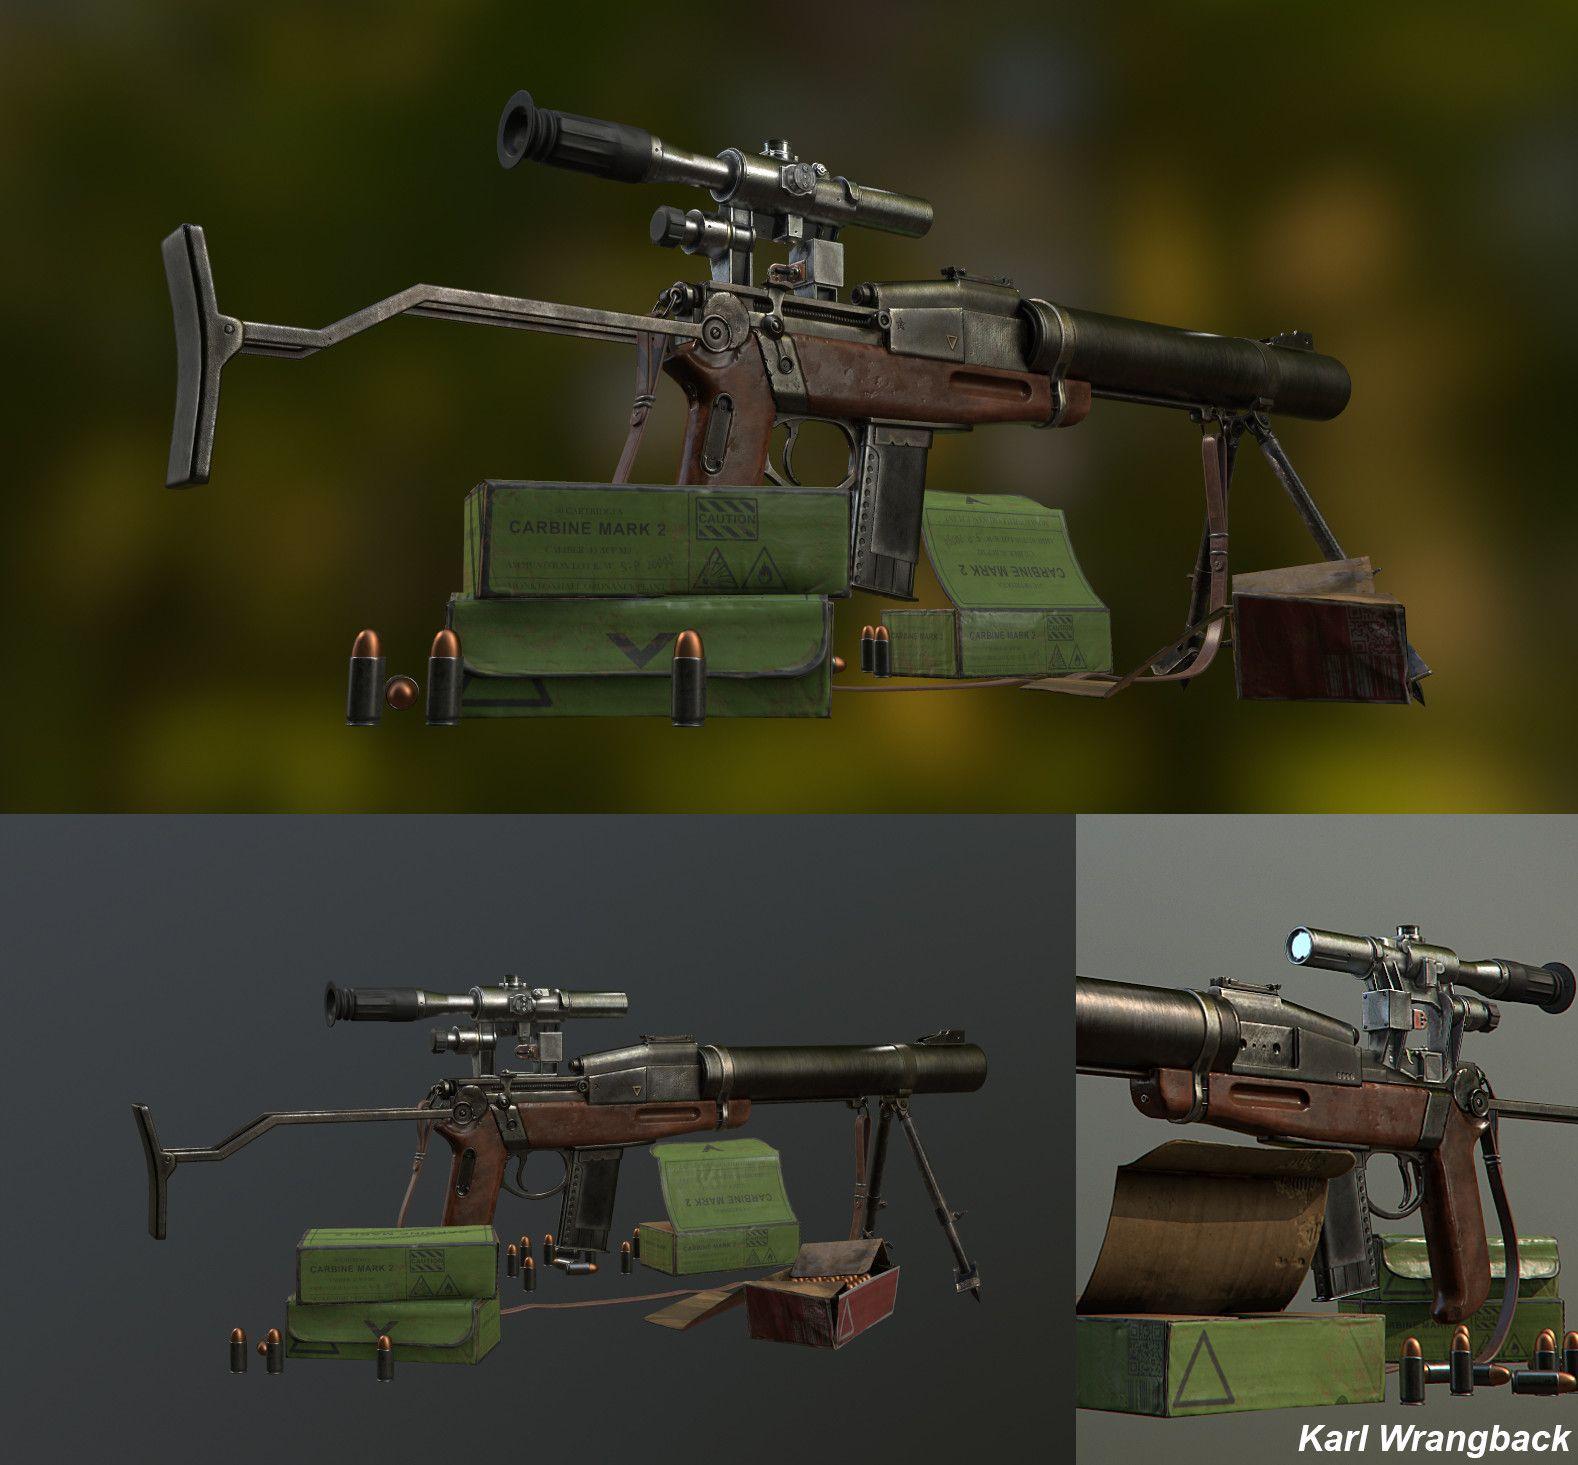 ArtStation - De-Lisle Commando Carbine Mark 2  45acp, Karl